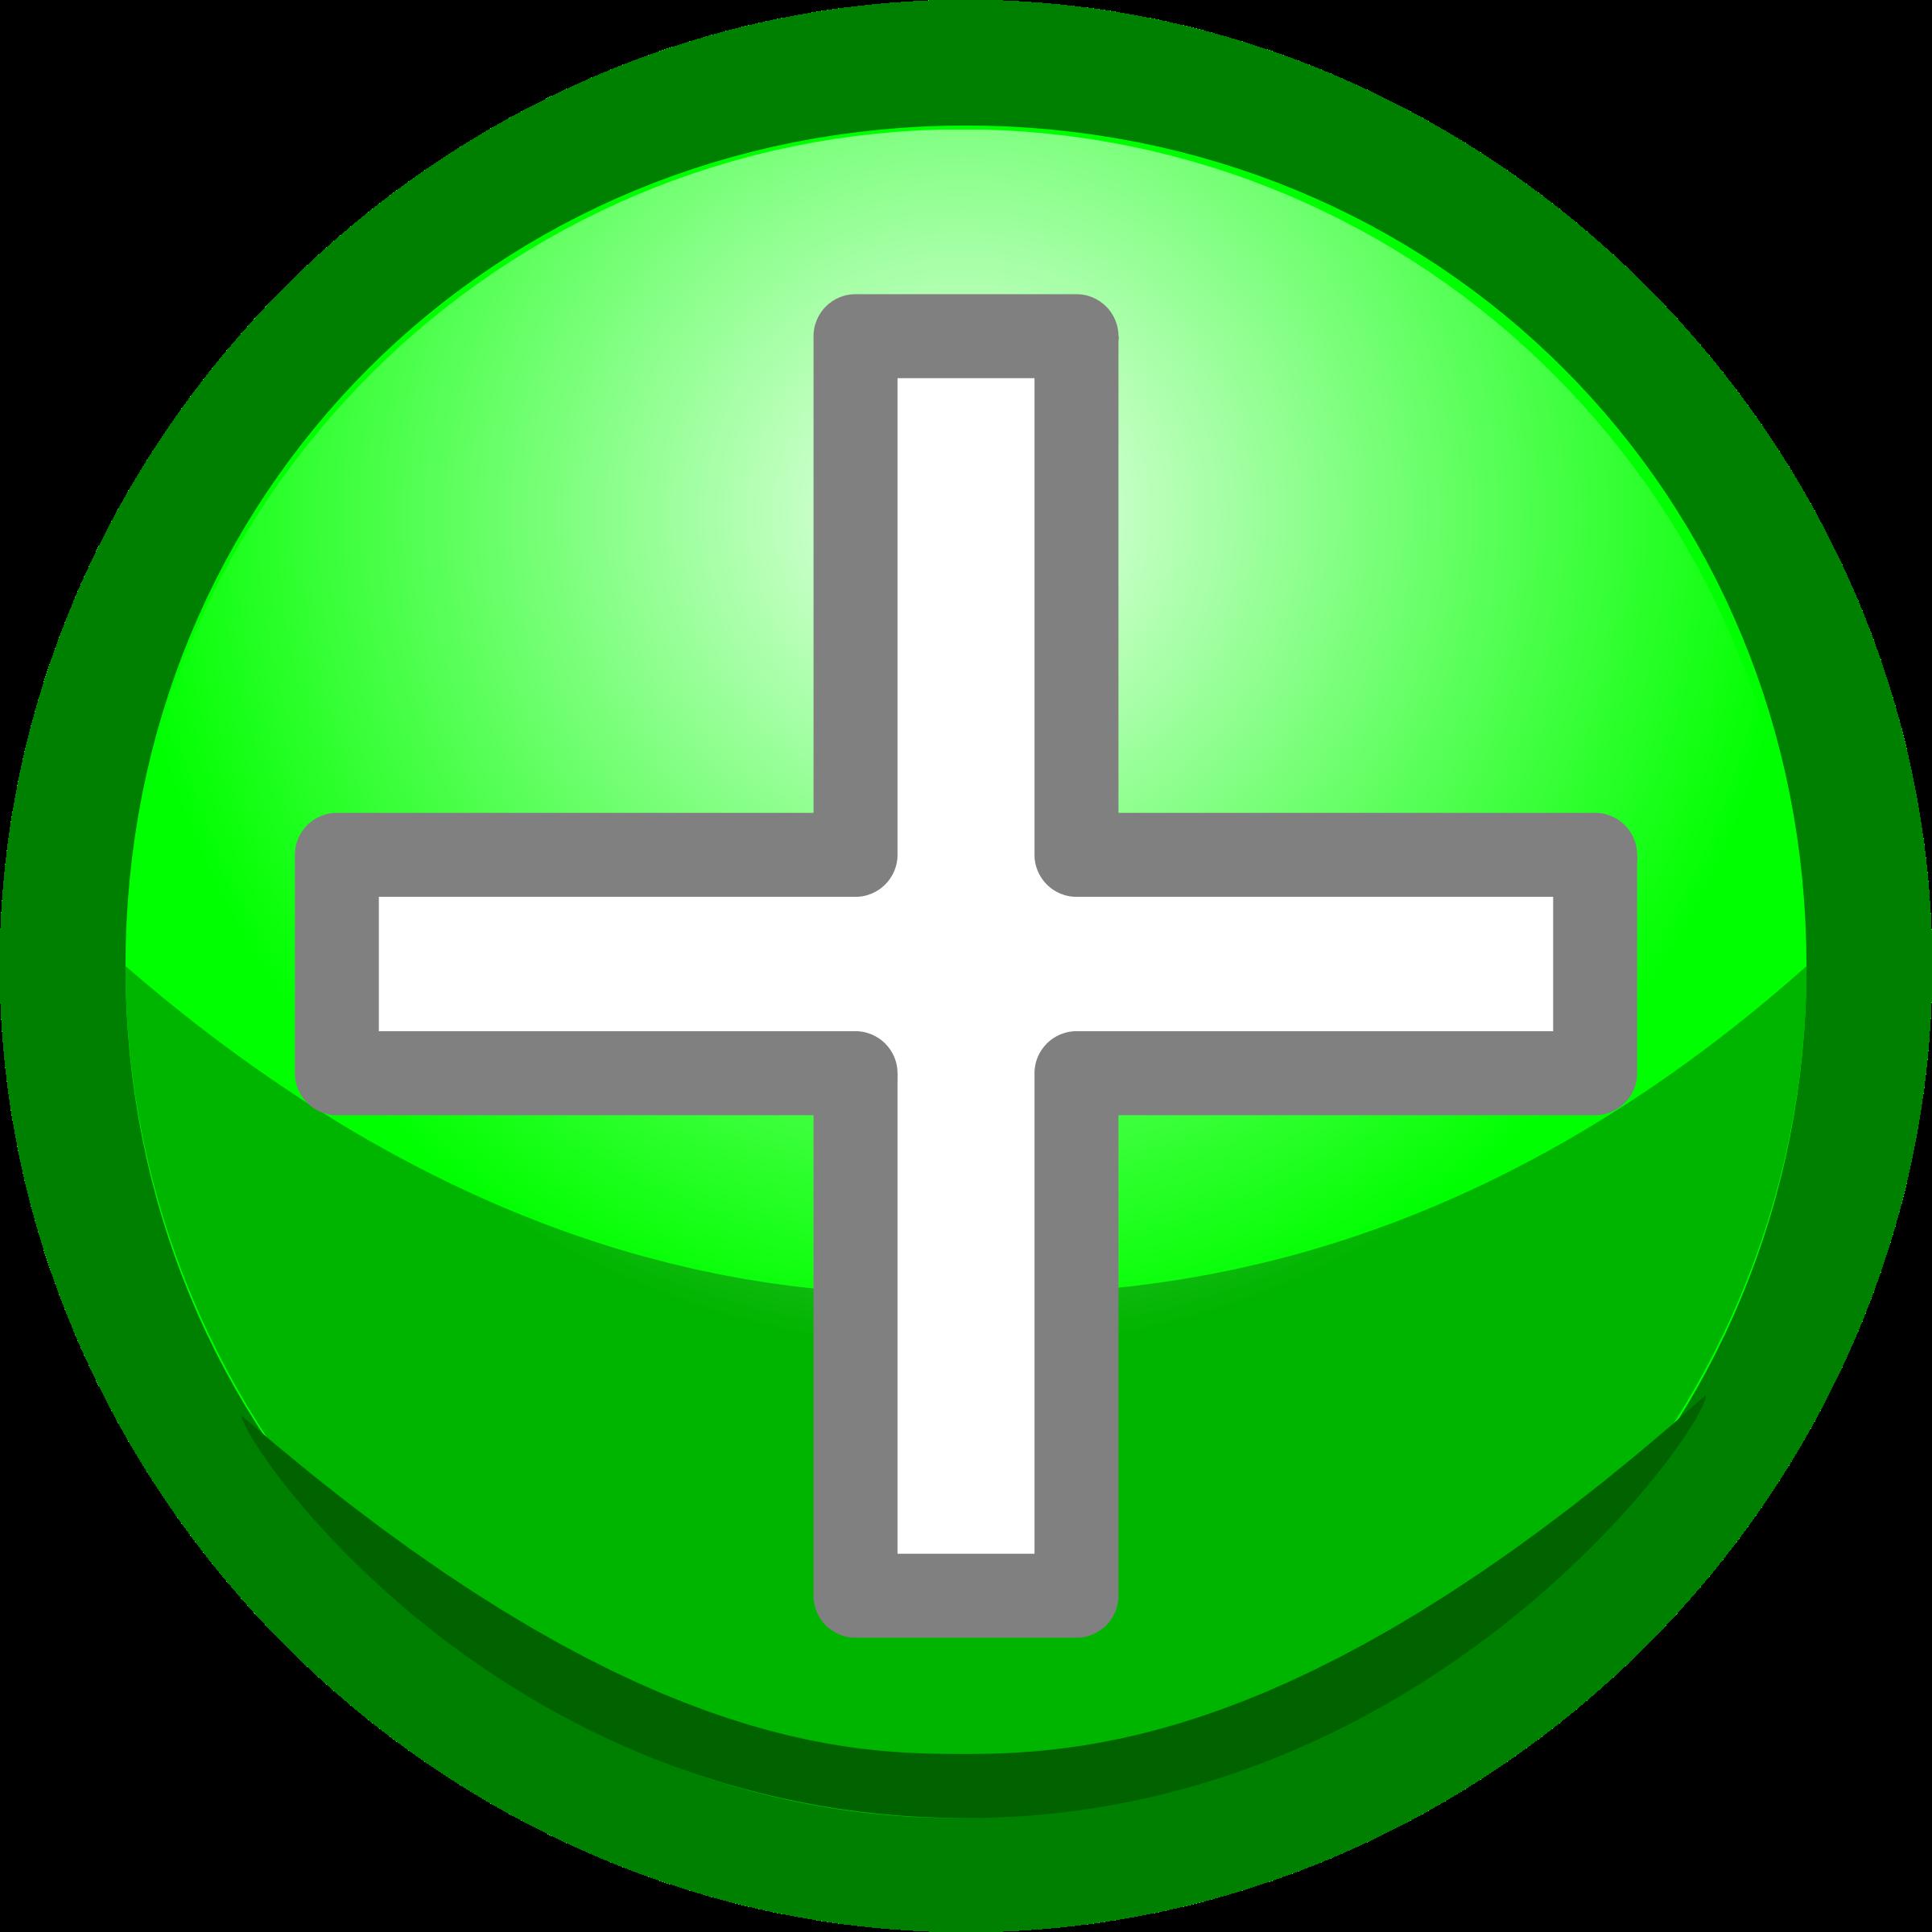 Clipart circle green. Plus big image png